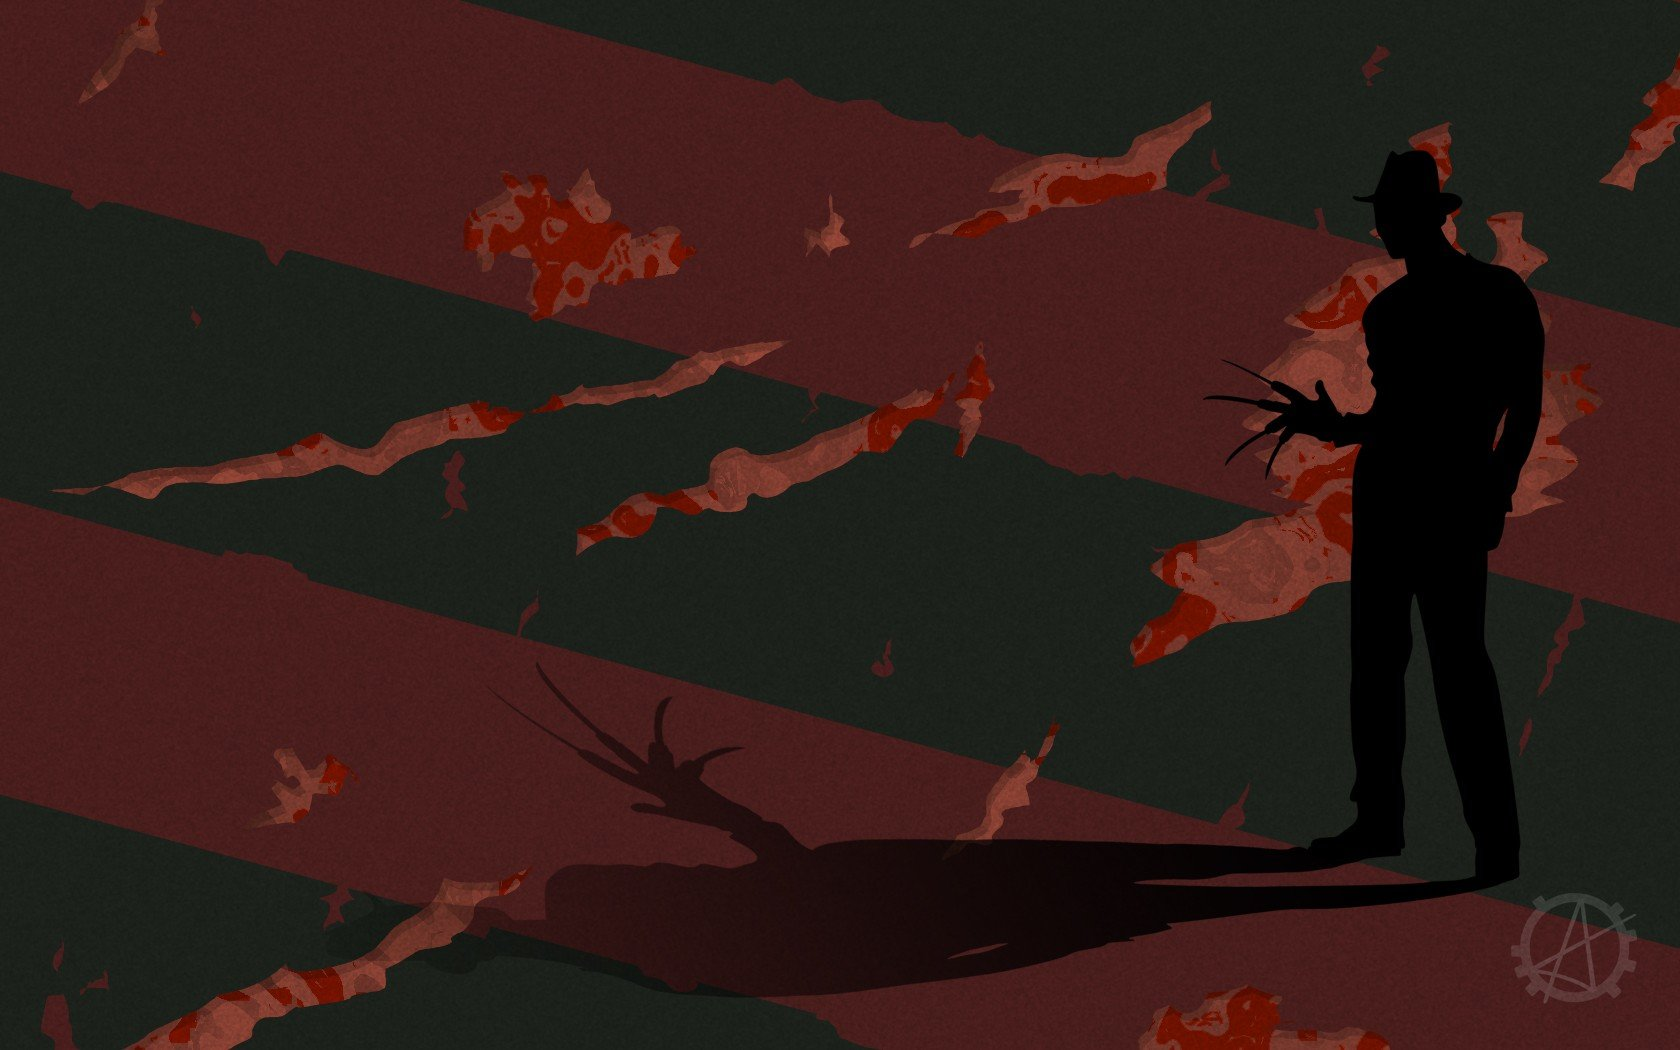 Dark Freddy Krueger wallpaper 1680x1050 261891 1680x1050